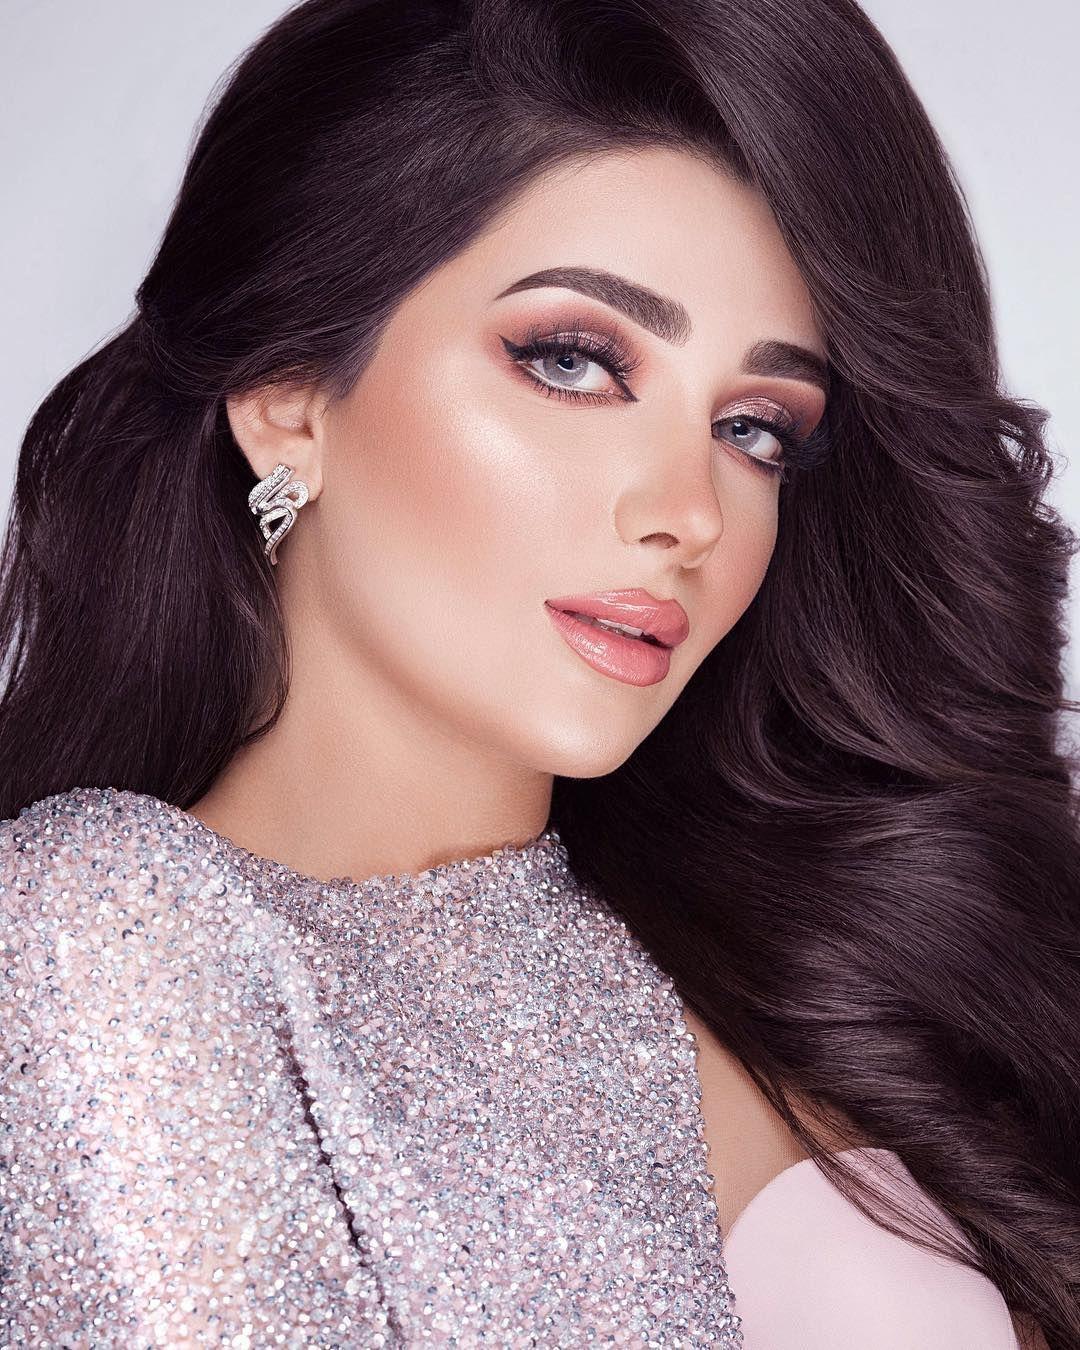 Image May Contain 1 Person Closeup Fashion Makeup Hair Beauty Hair Styles